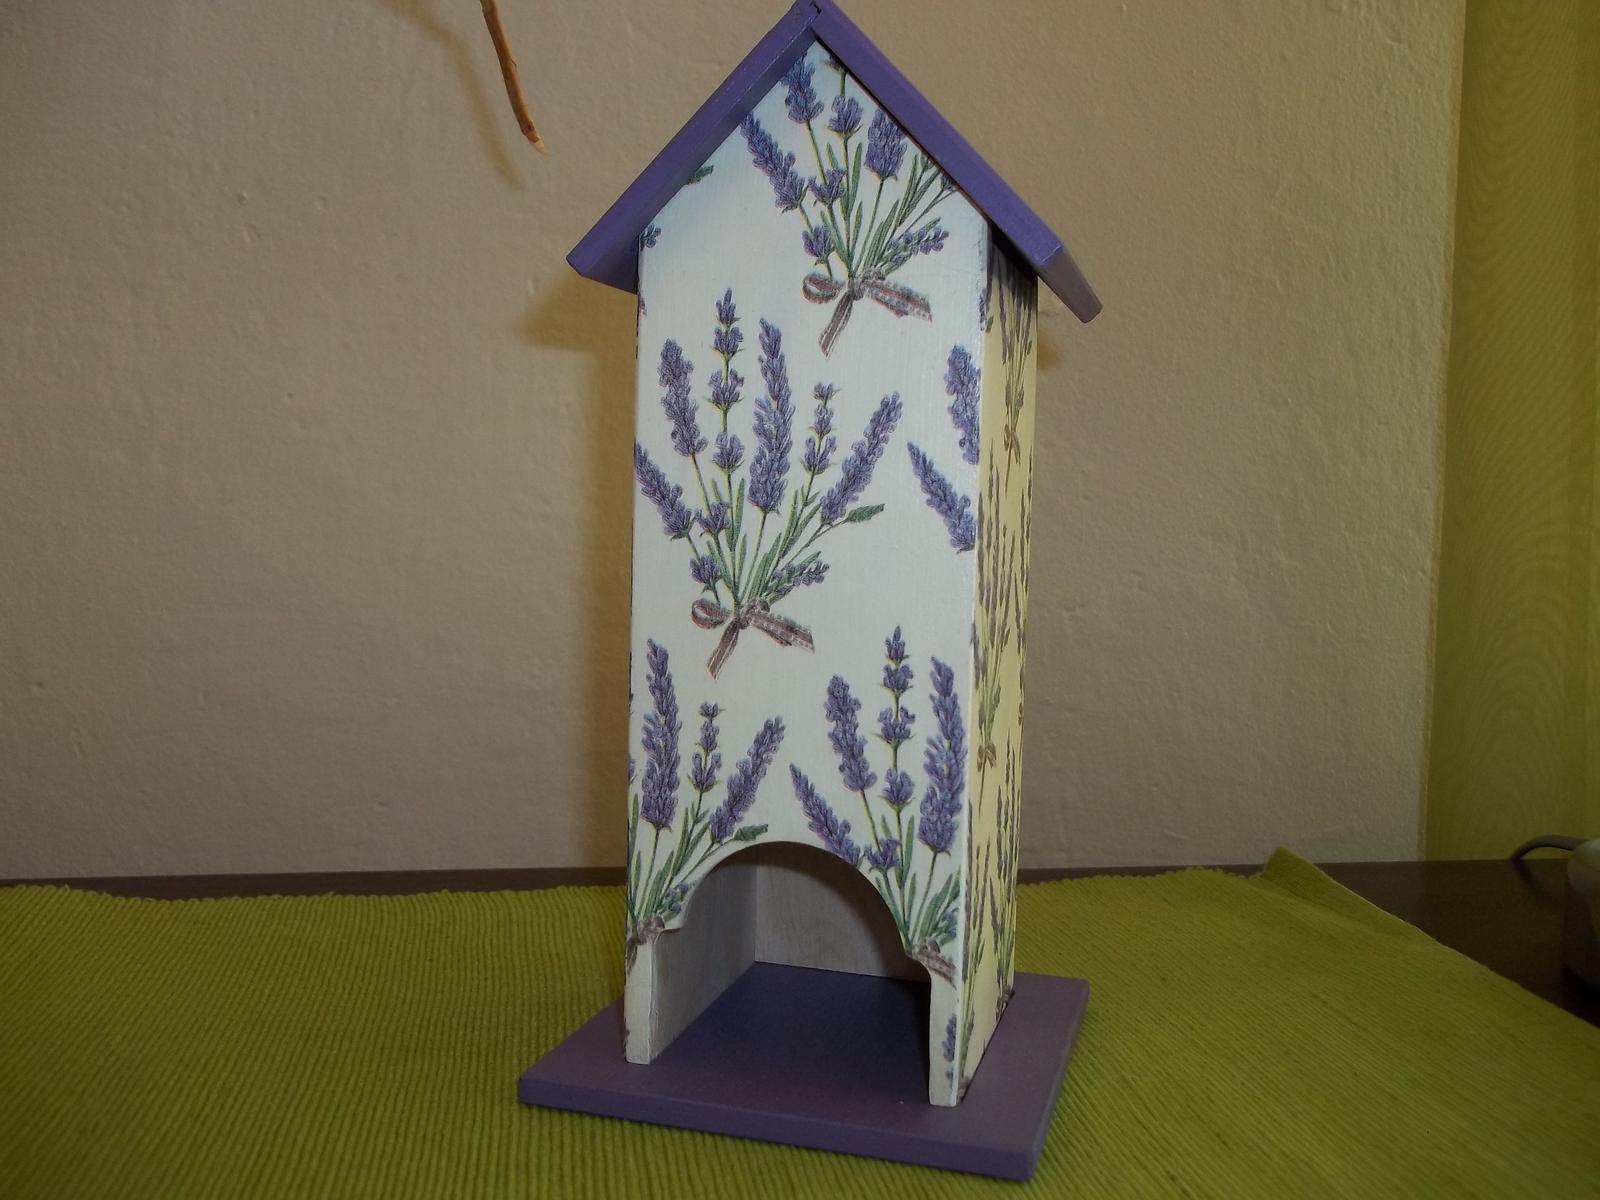 Drevený domček na čajové vrecúška s levanduľou,s poštou - Obrázok č. 1